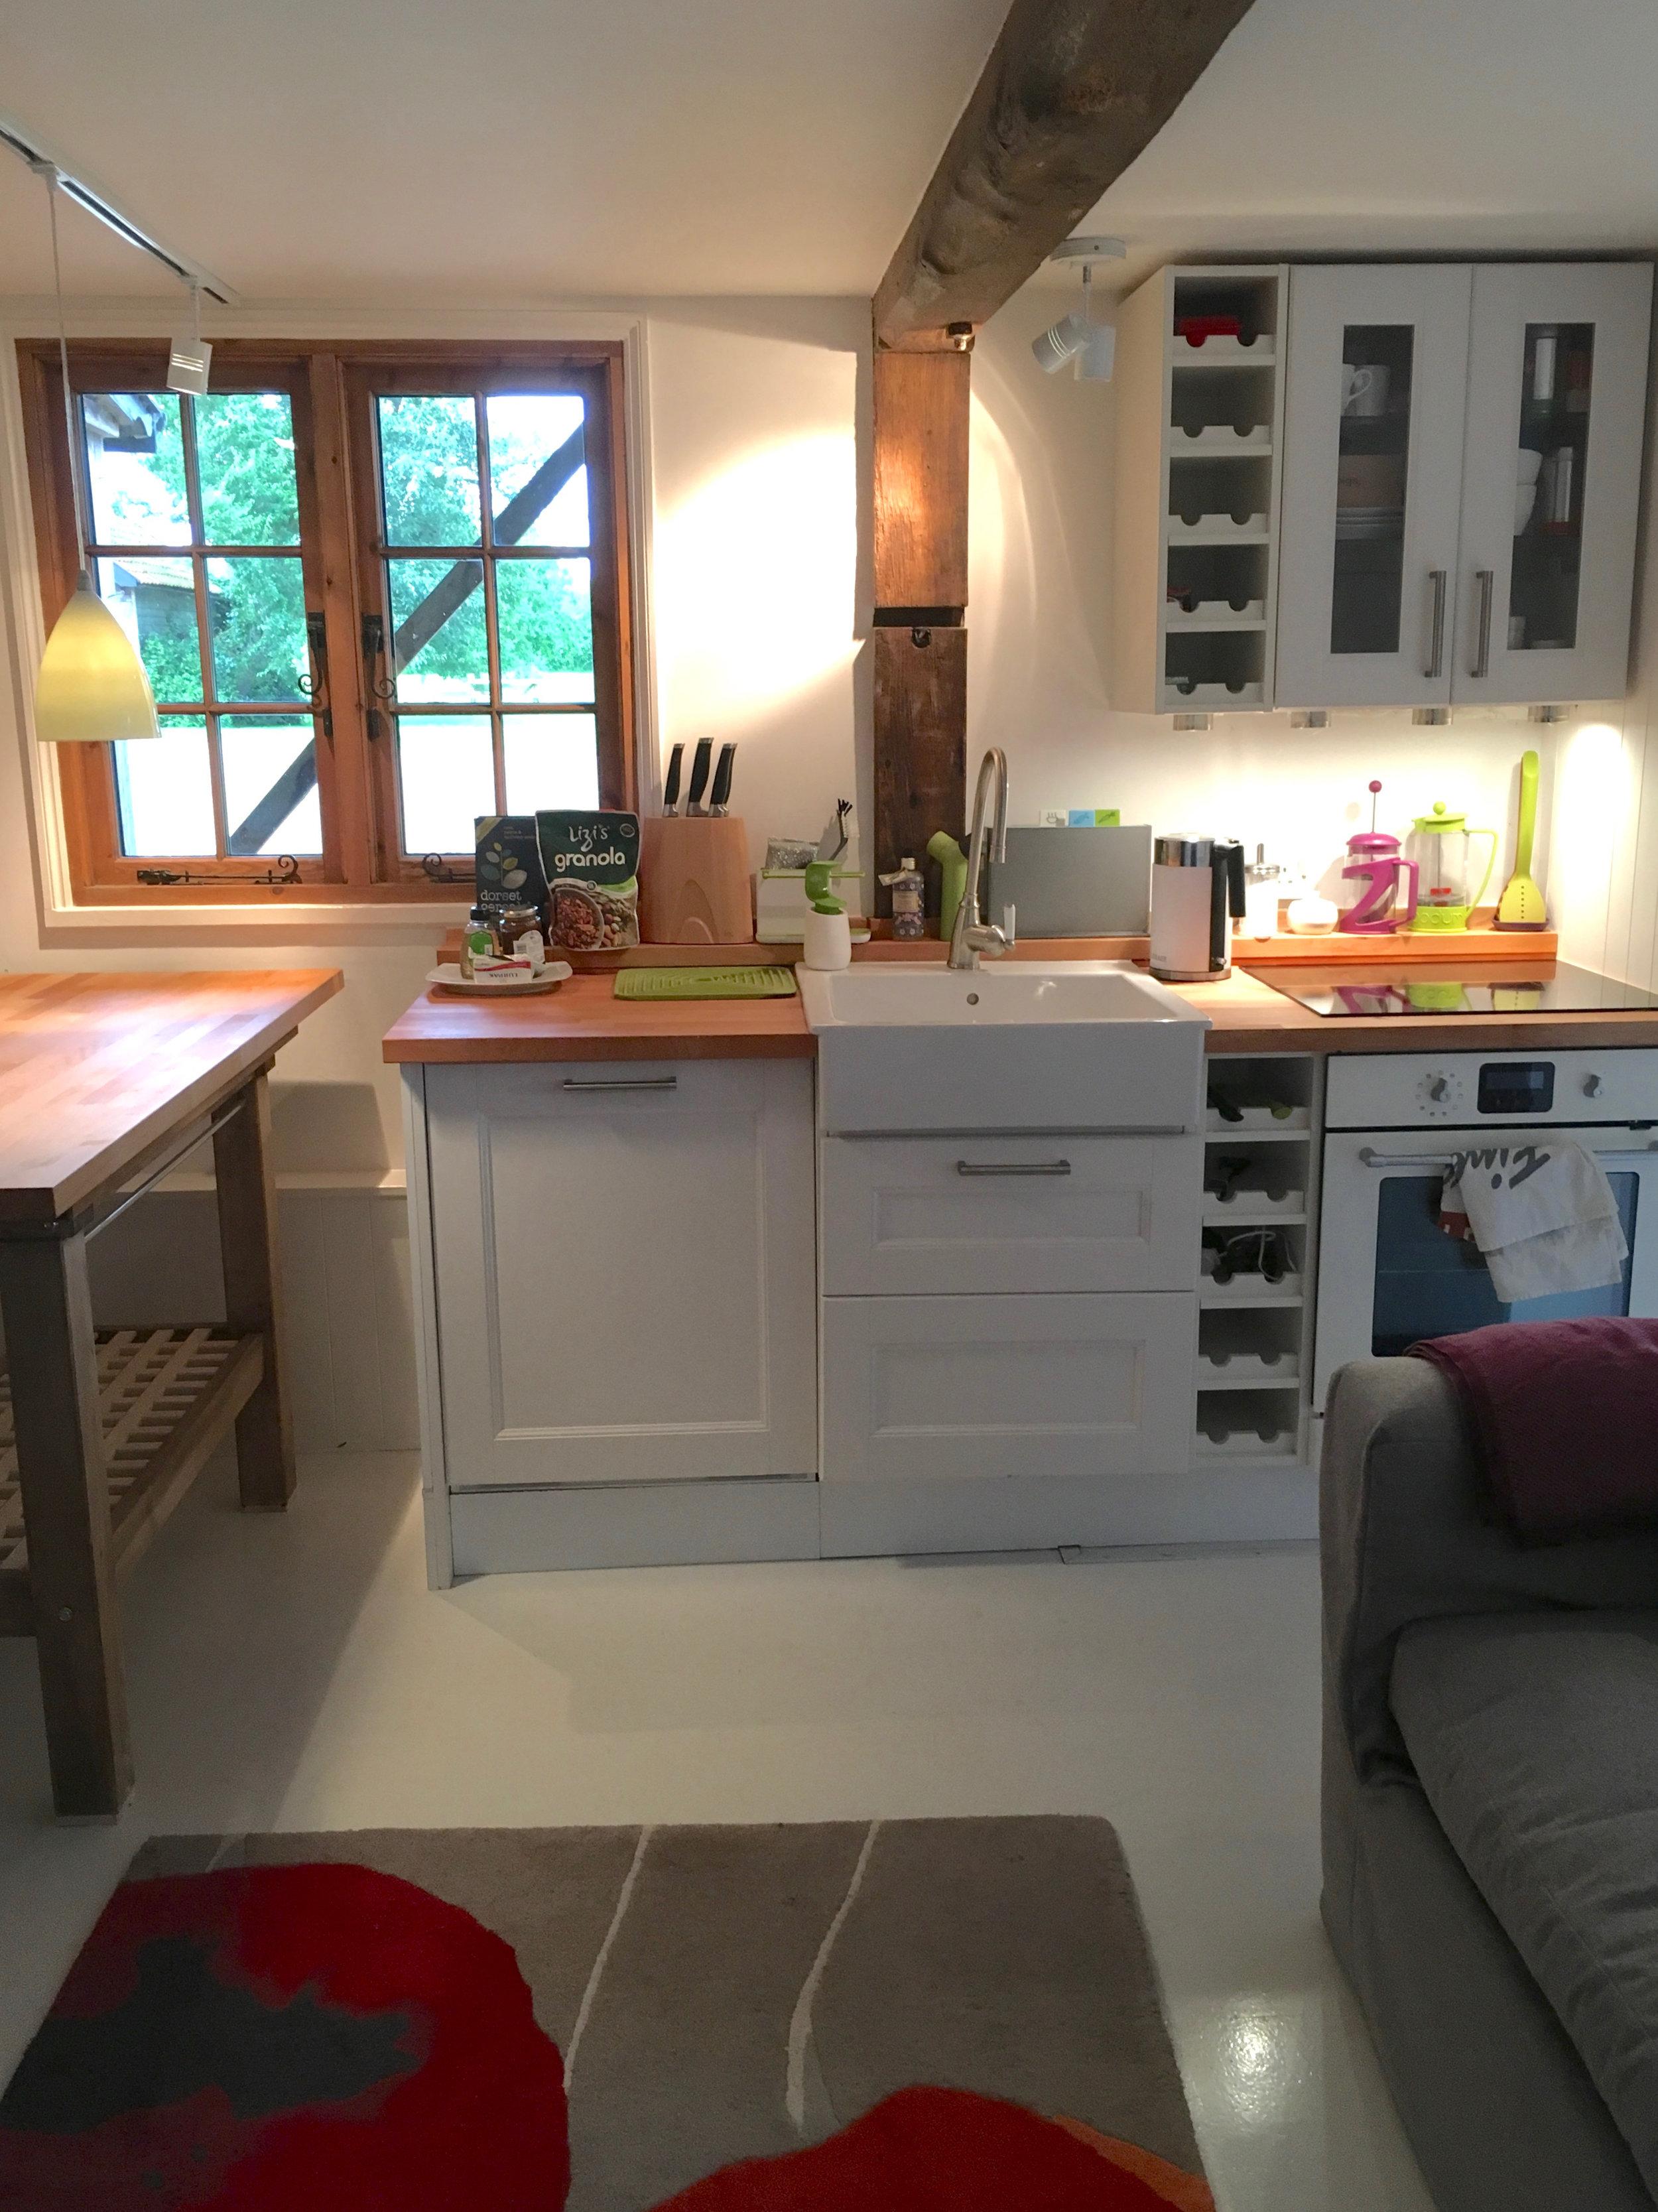 Compact and bijoux kitchen